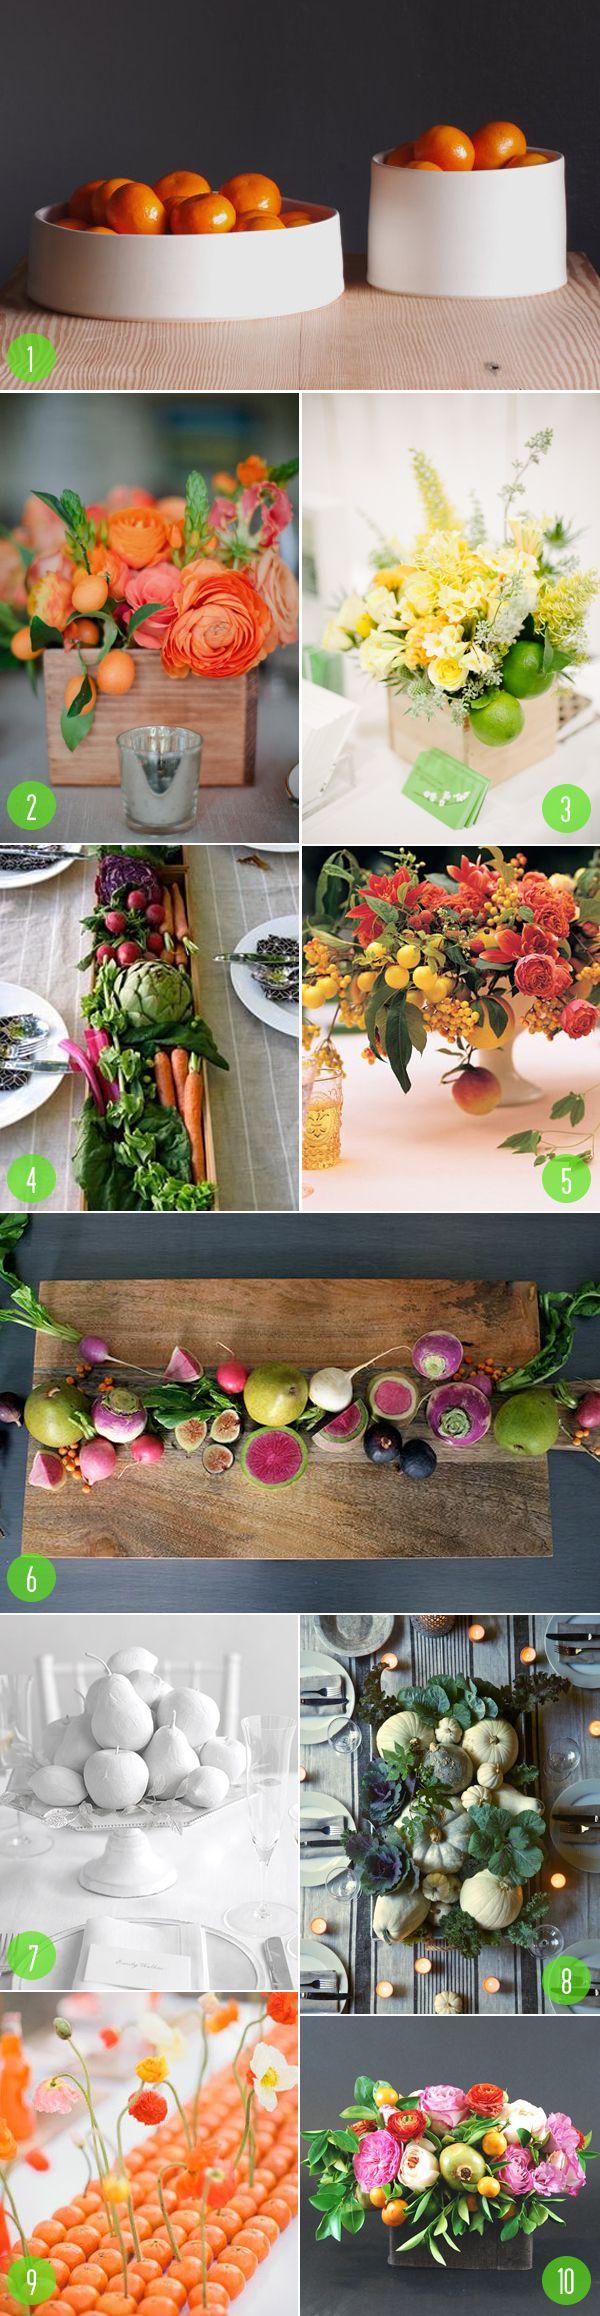 Top 10: Fruit & veggie centerpieces